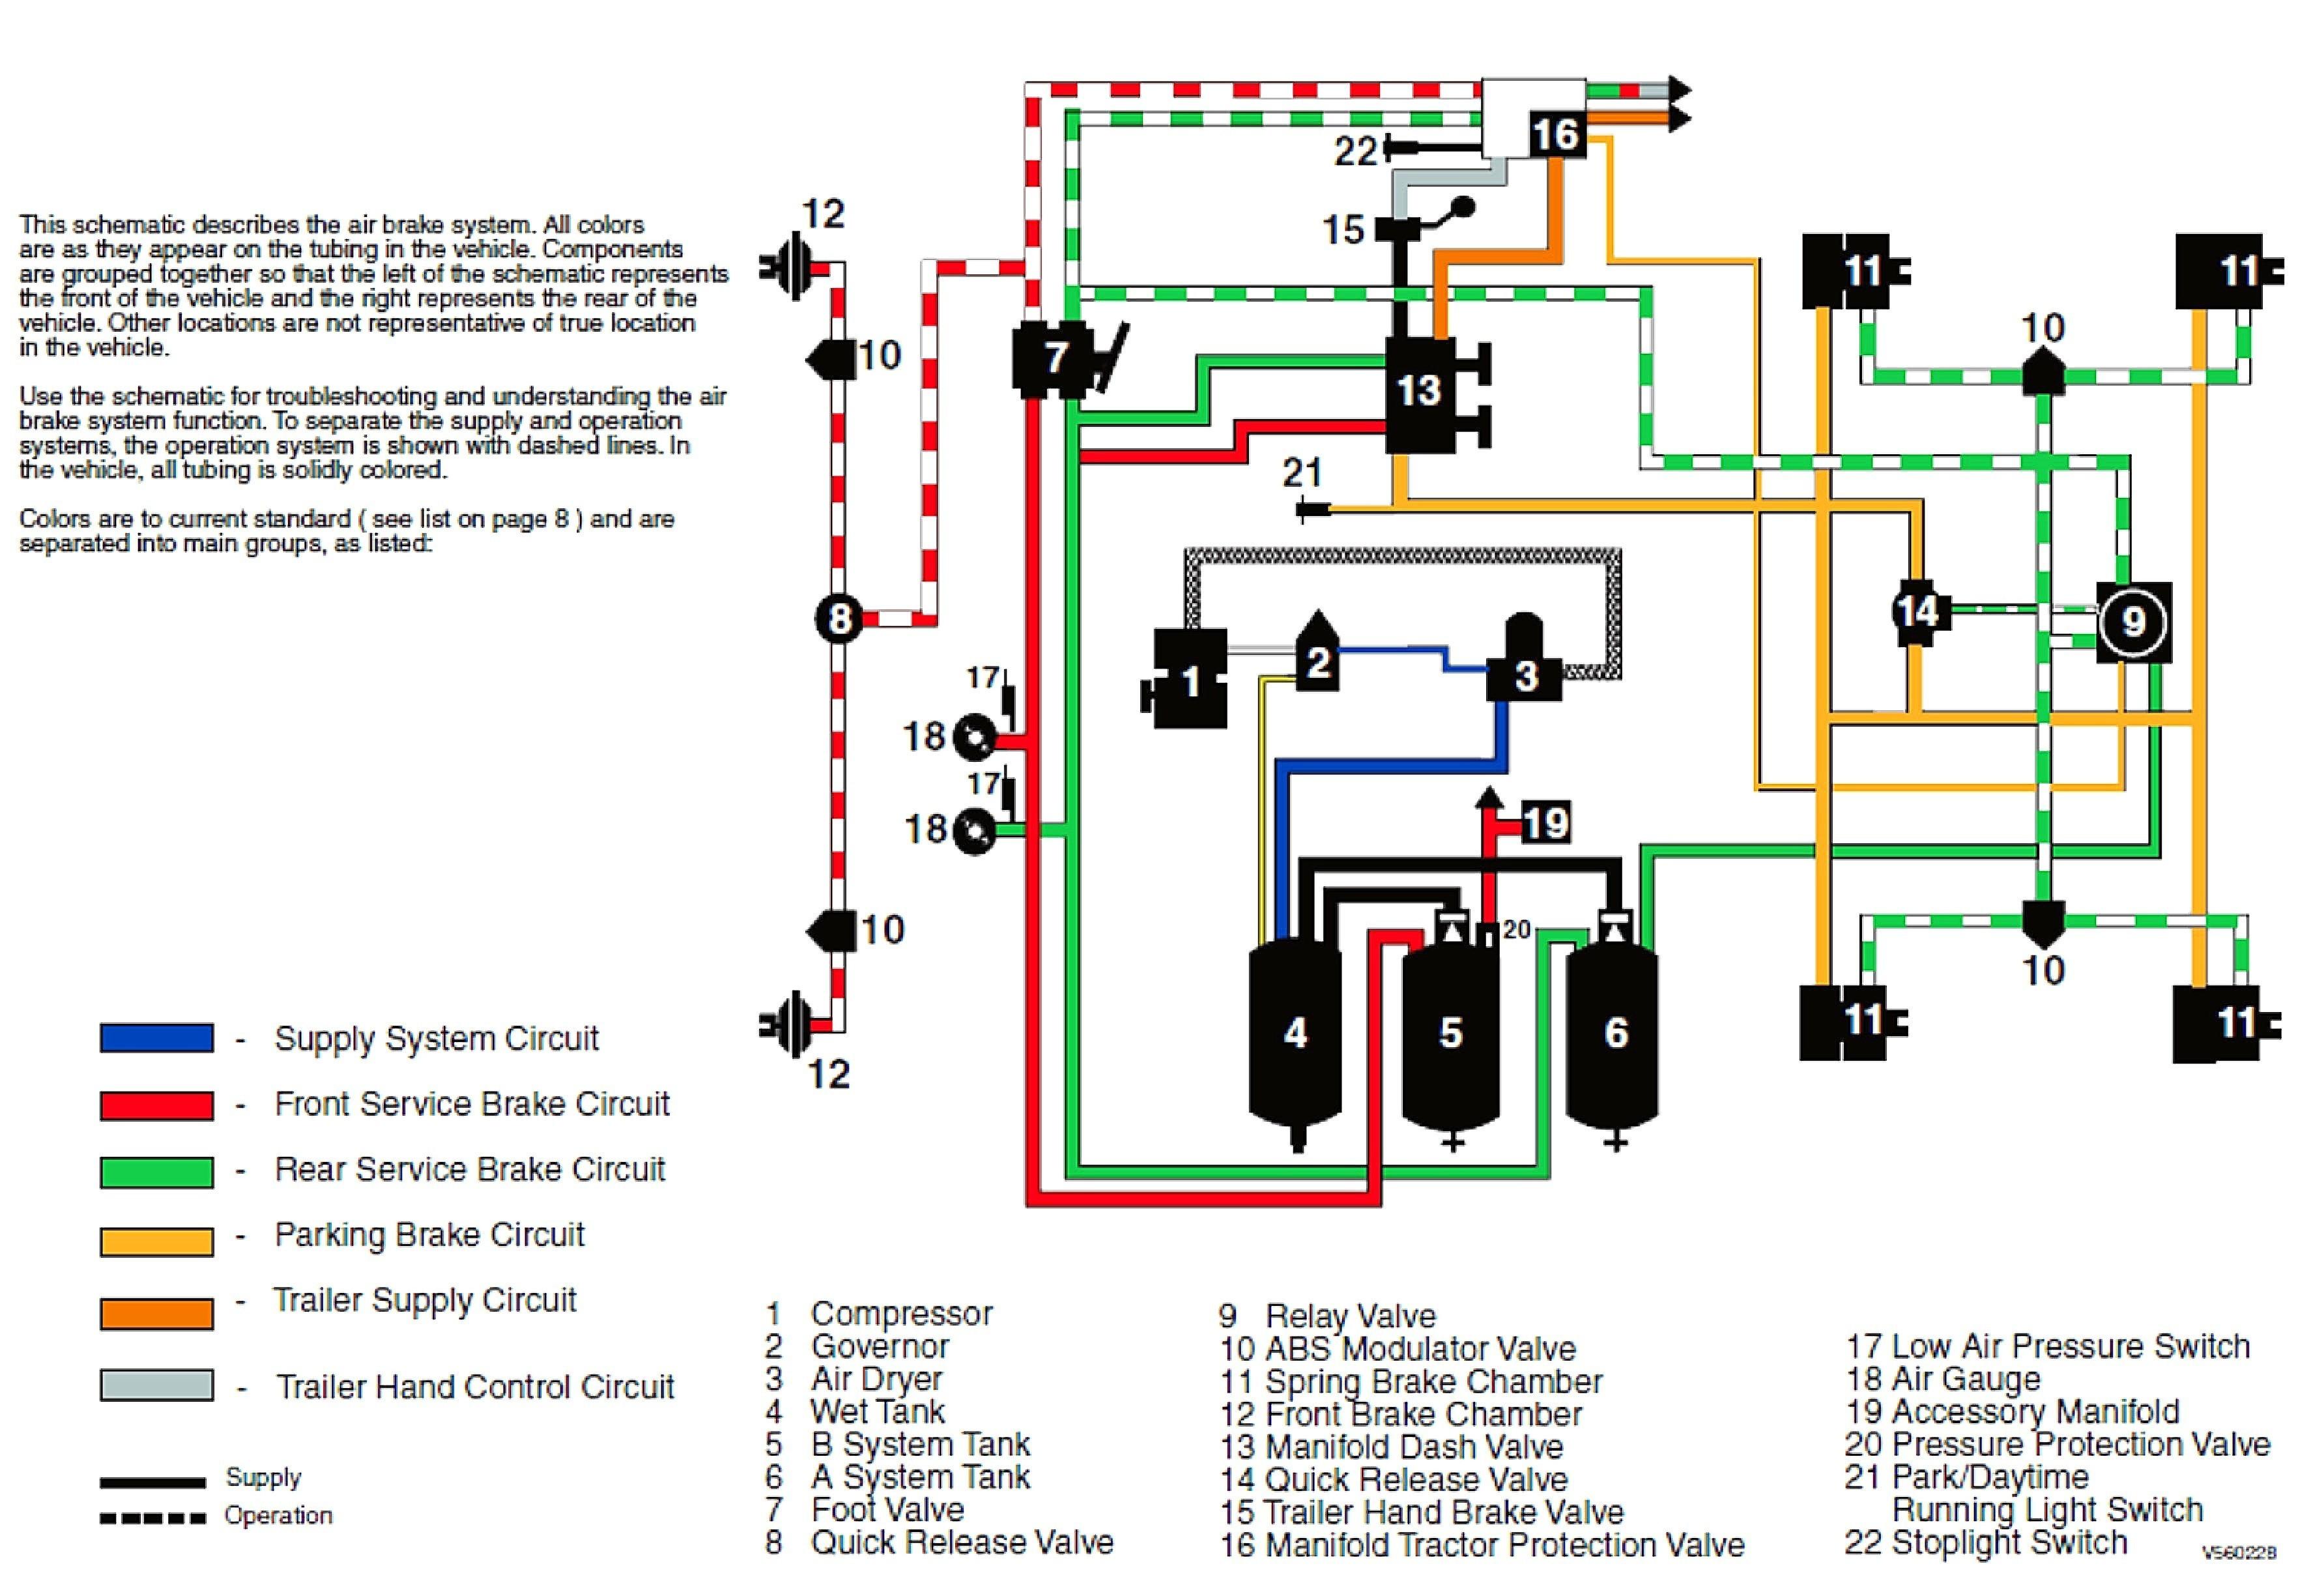 Wiring Diagram for Trailer Breakaway Kit New Wiring Diagram for Redarc Electric Brake Controller Fresh Wiring